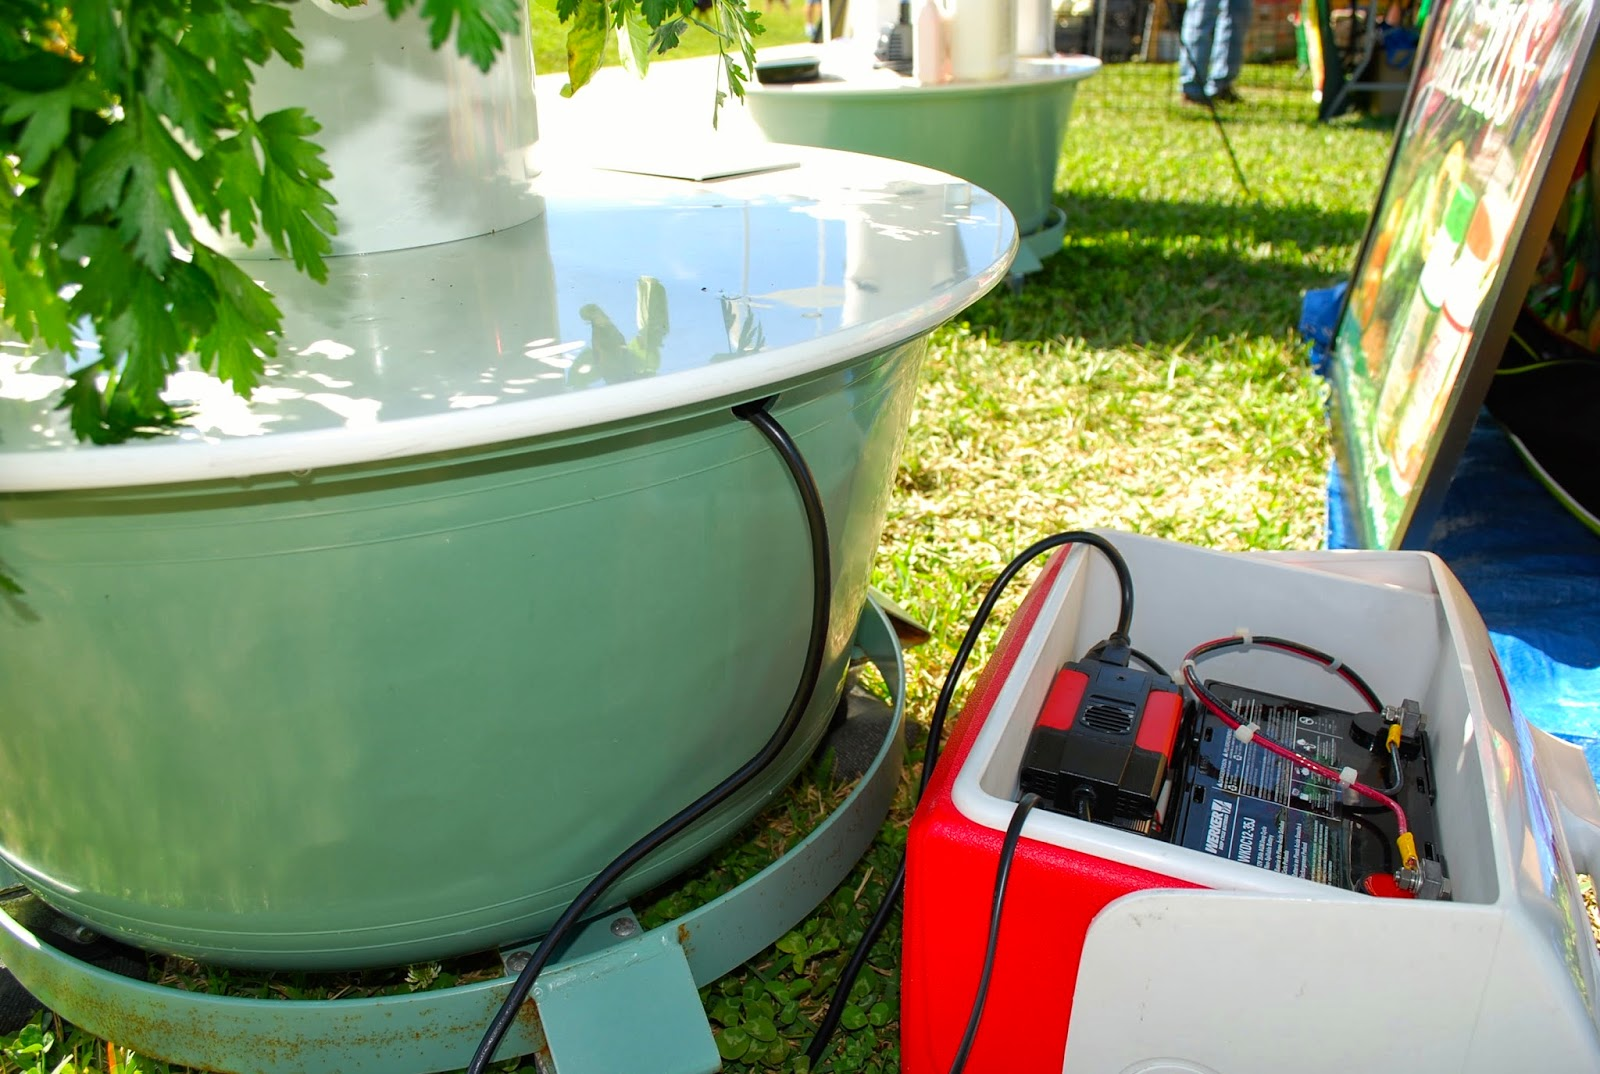 Helen A Lockey Solar Powered Aeroponic Tower Garden by Juice Plus